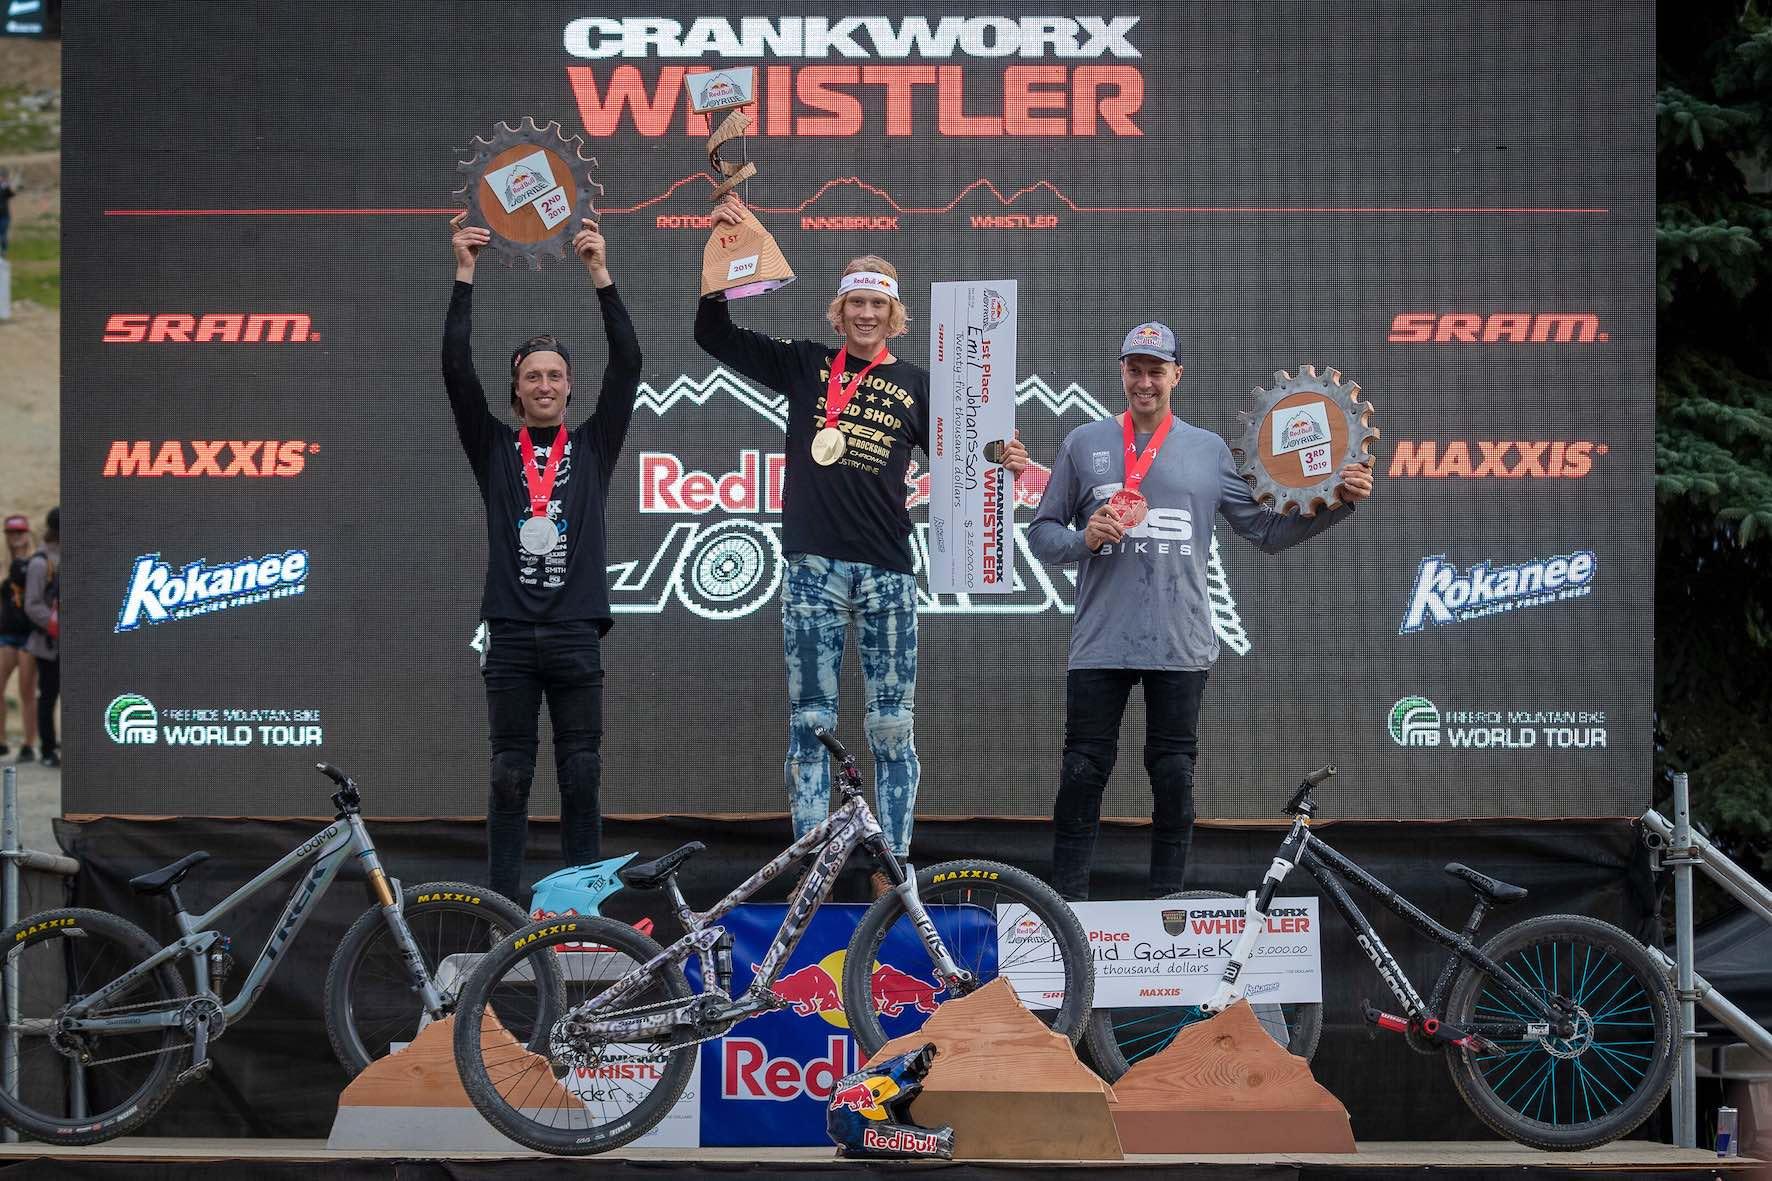 2019 Crankworx Whistler Slopestyle MTB podium